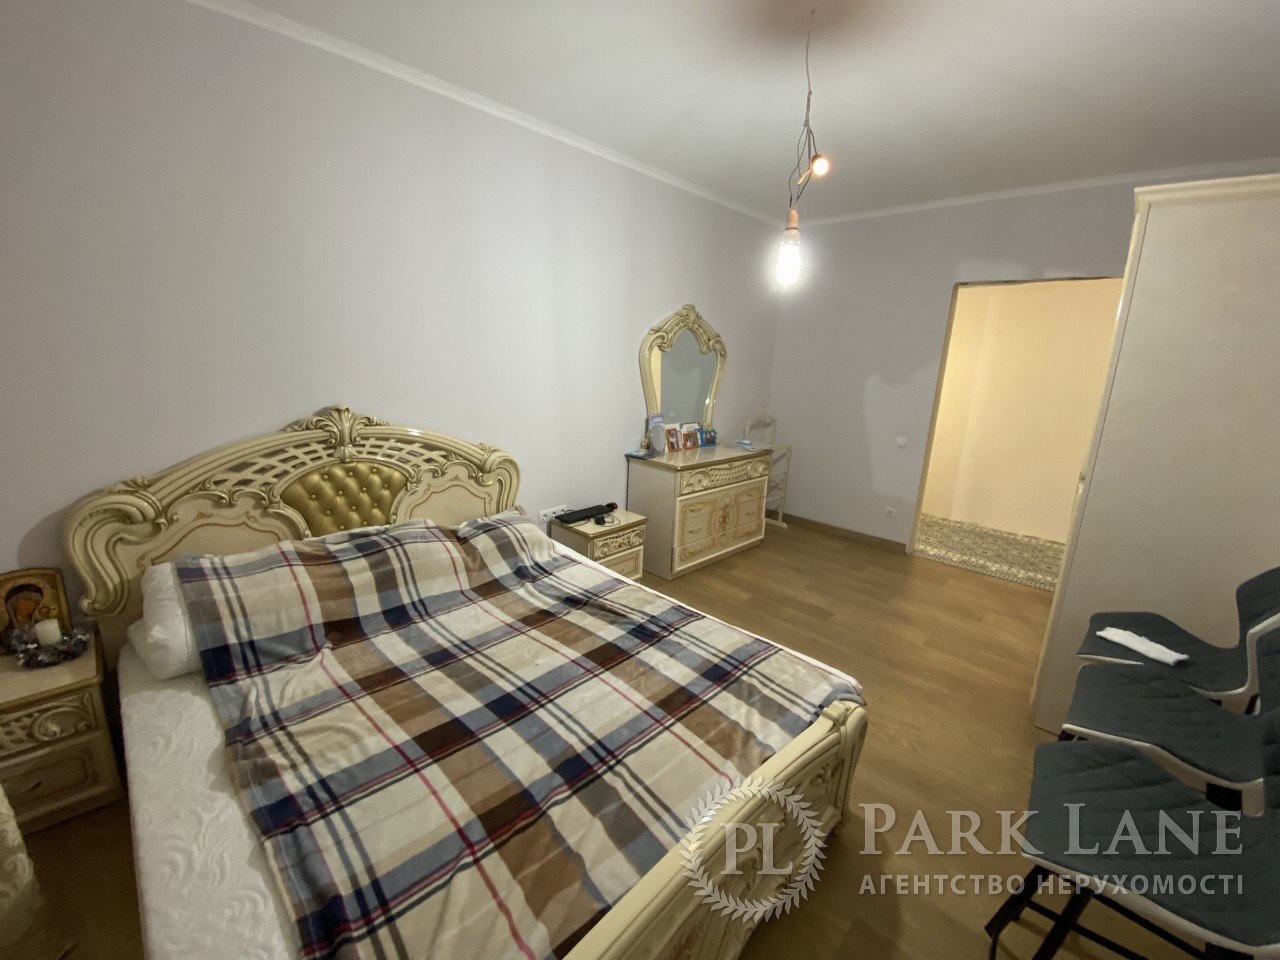 Квартира R-39276, Чавдар Елизаветы, 13, Киев - Фото 9